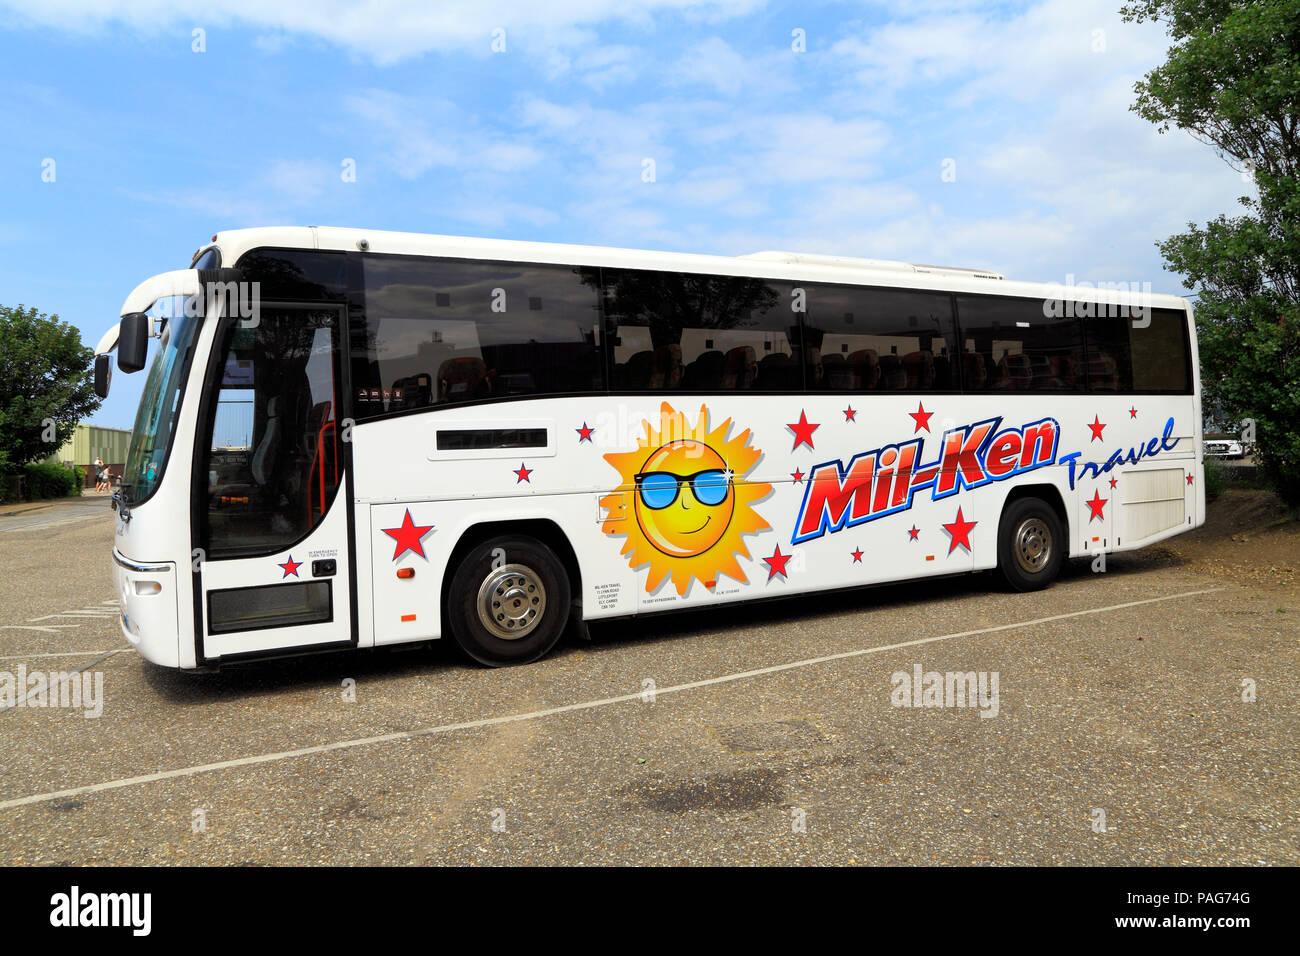 Mil-Ken, Reisebus, Tagesausflüge, Littleport, Cambridgeshire, UK, Urlaub, Trainer, Reisen Stockbild